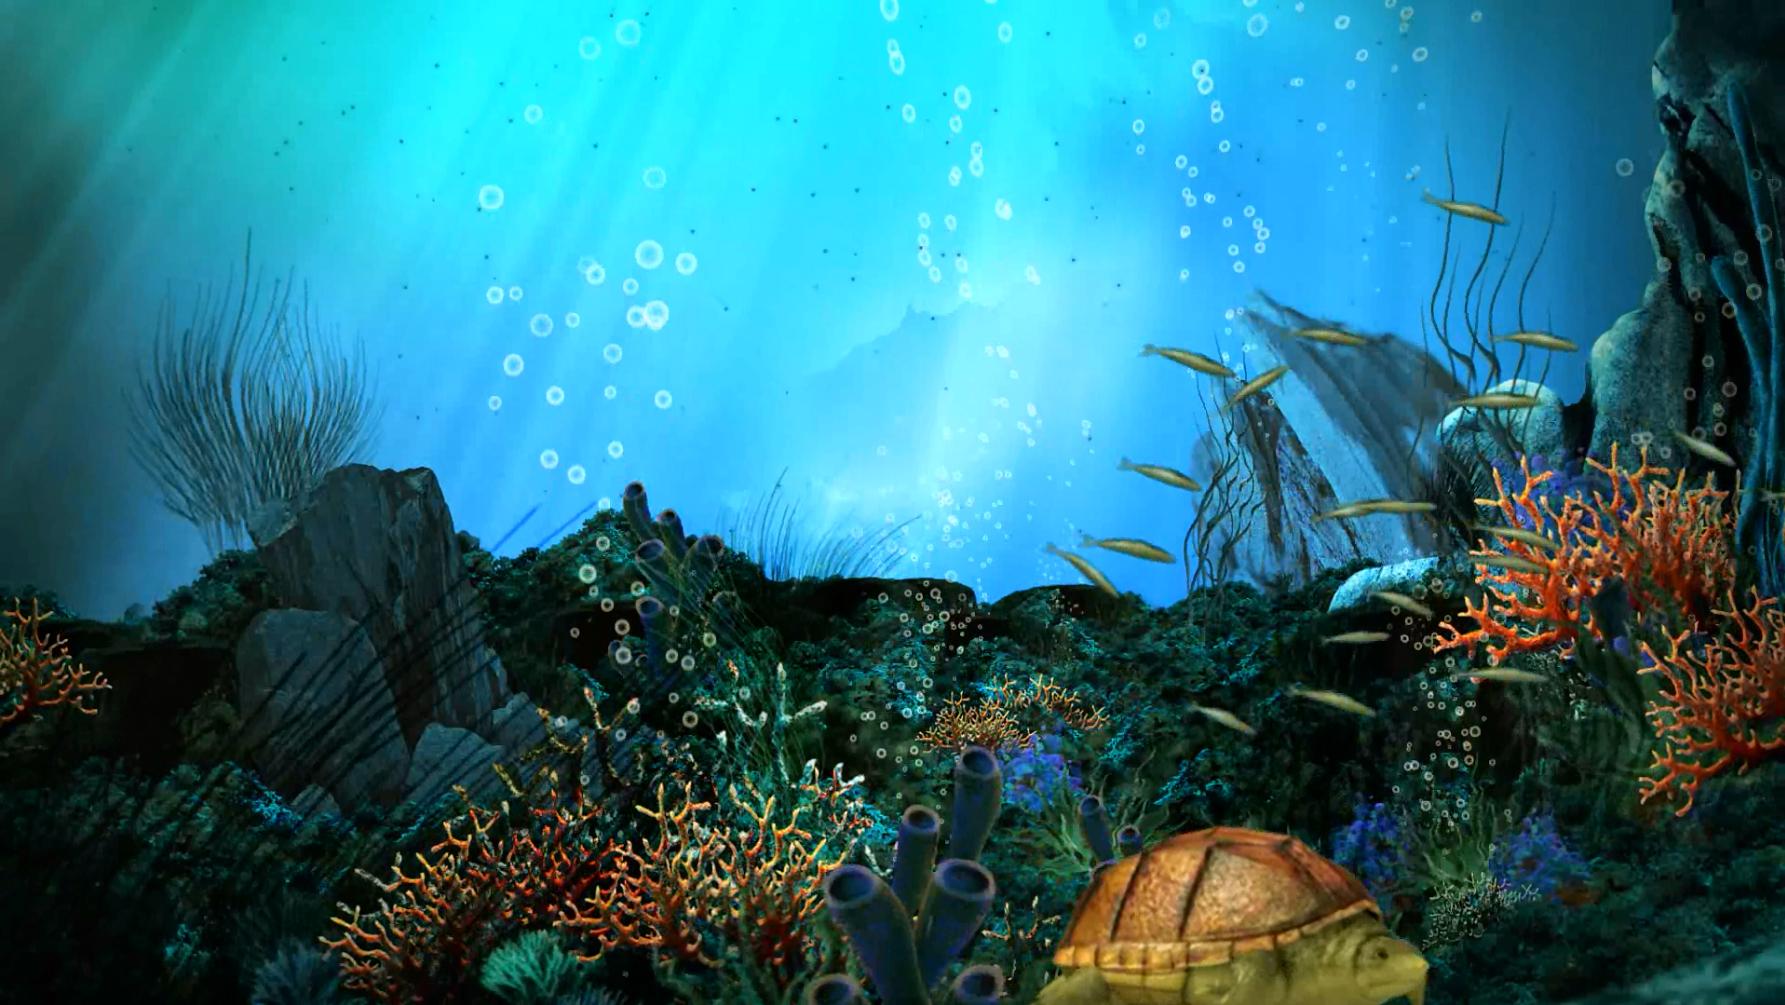 Картинка 3д с анимацией на телефон, днем наталии